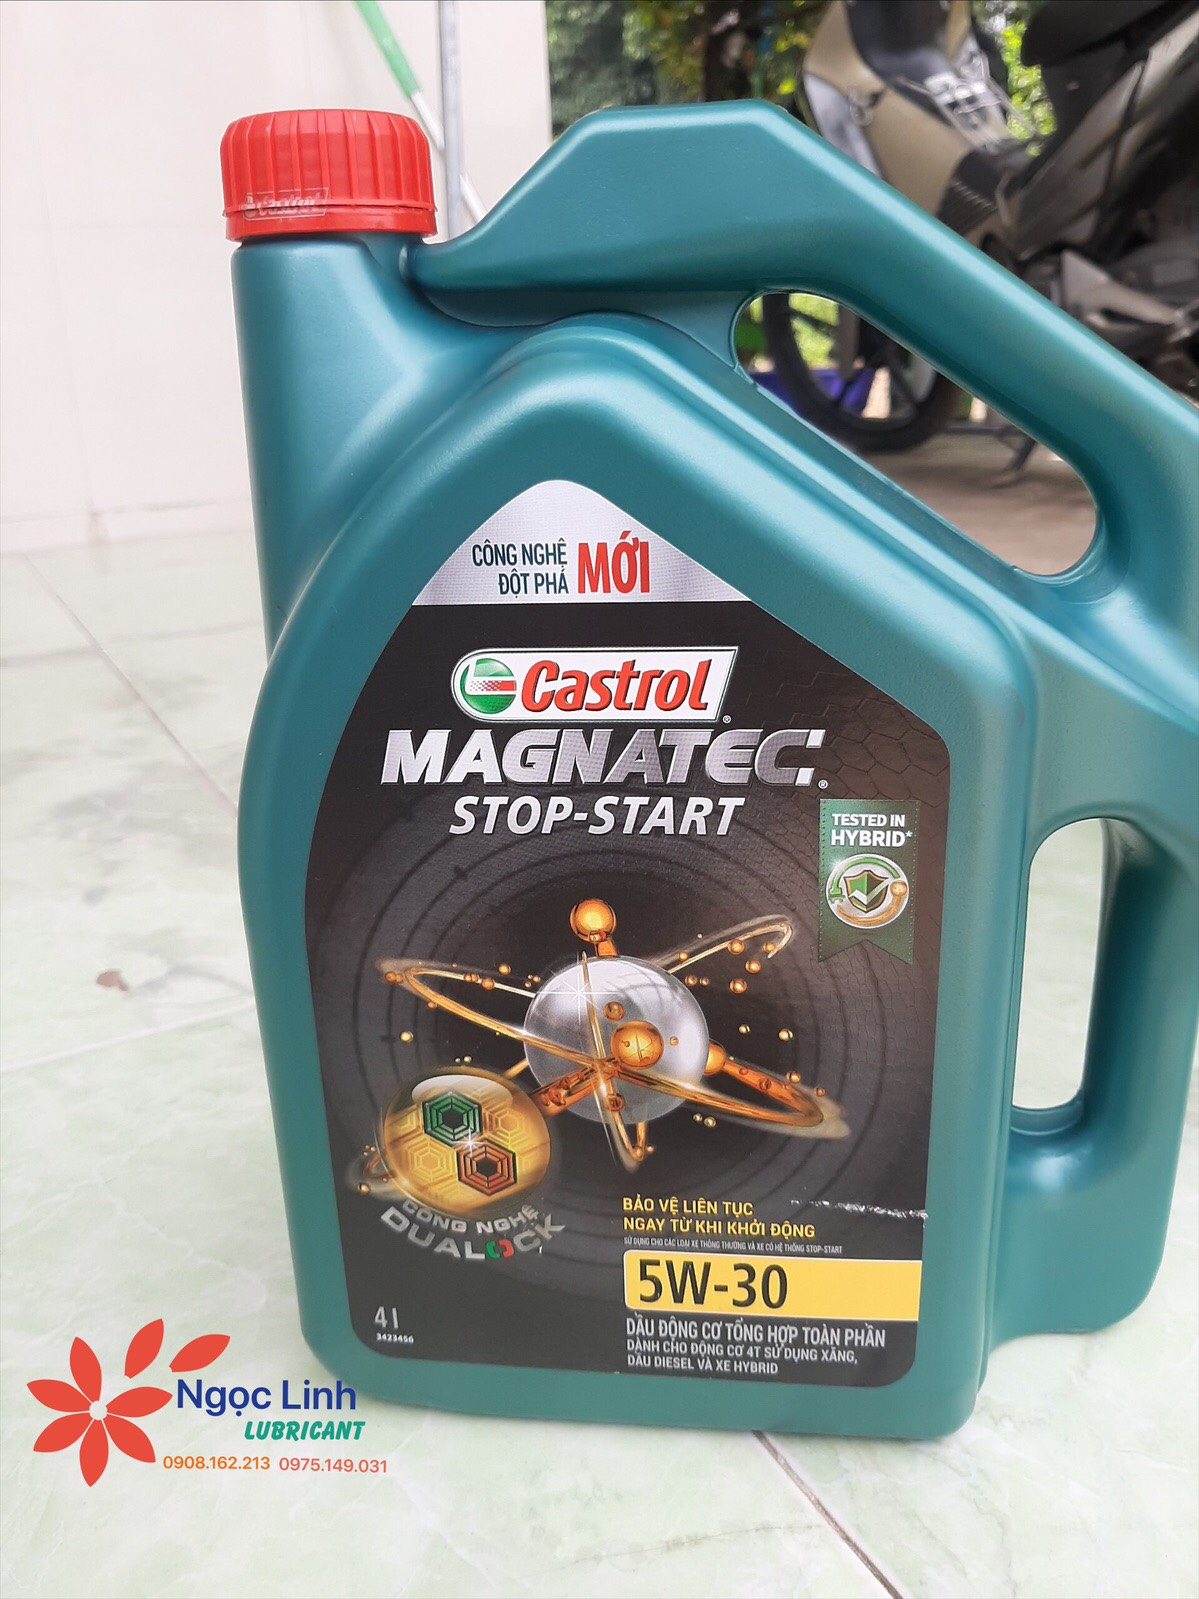 Castrol magnatec stop-start 5w30